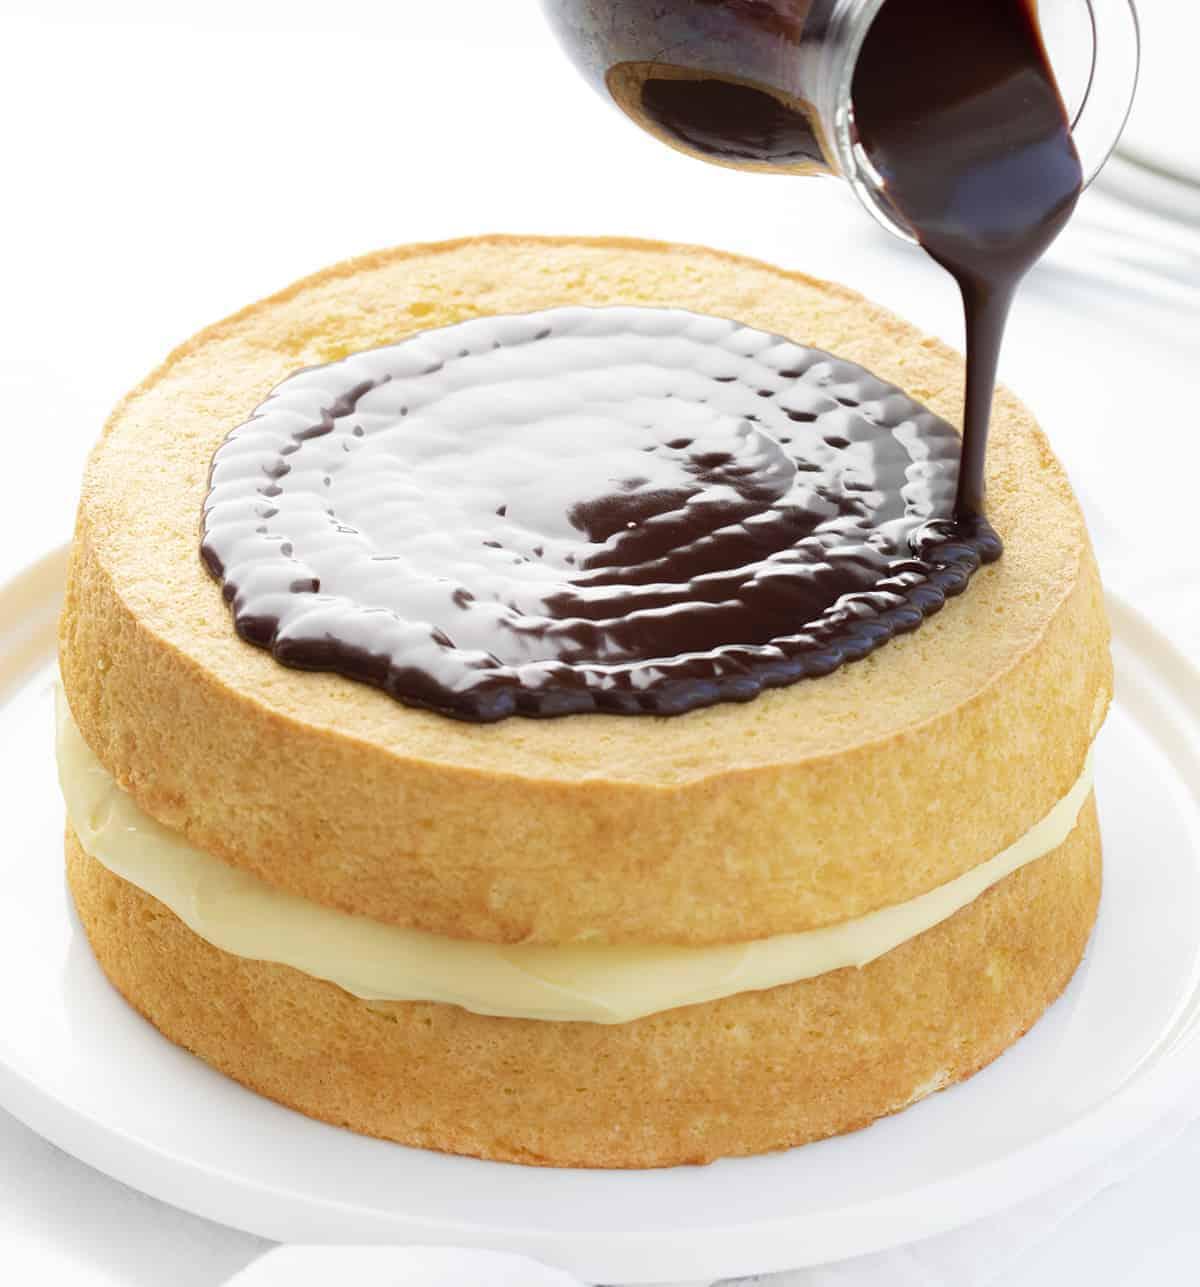 Pouring Chocolate over Boston Cream Pie